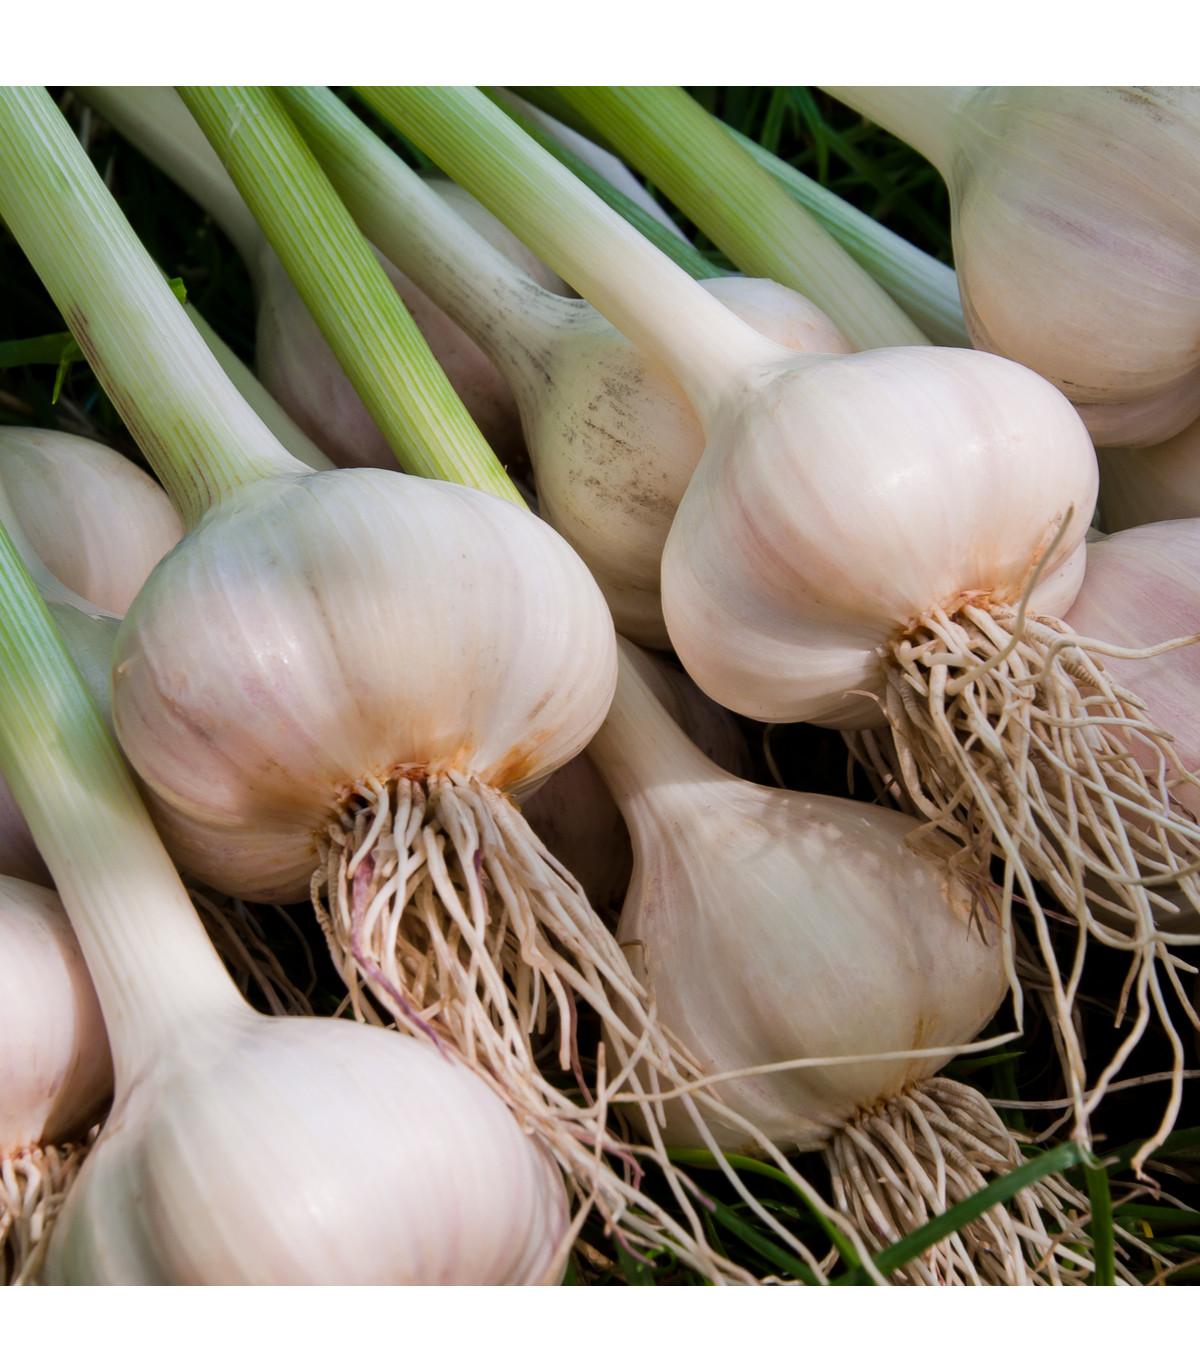 Sadbový česnek Dukát - Allium sativum - paličák - prodej cibulí česneku - 4 ks